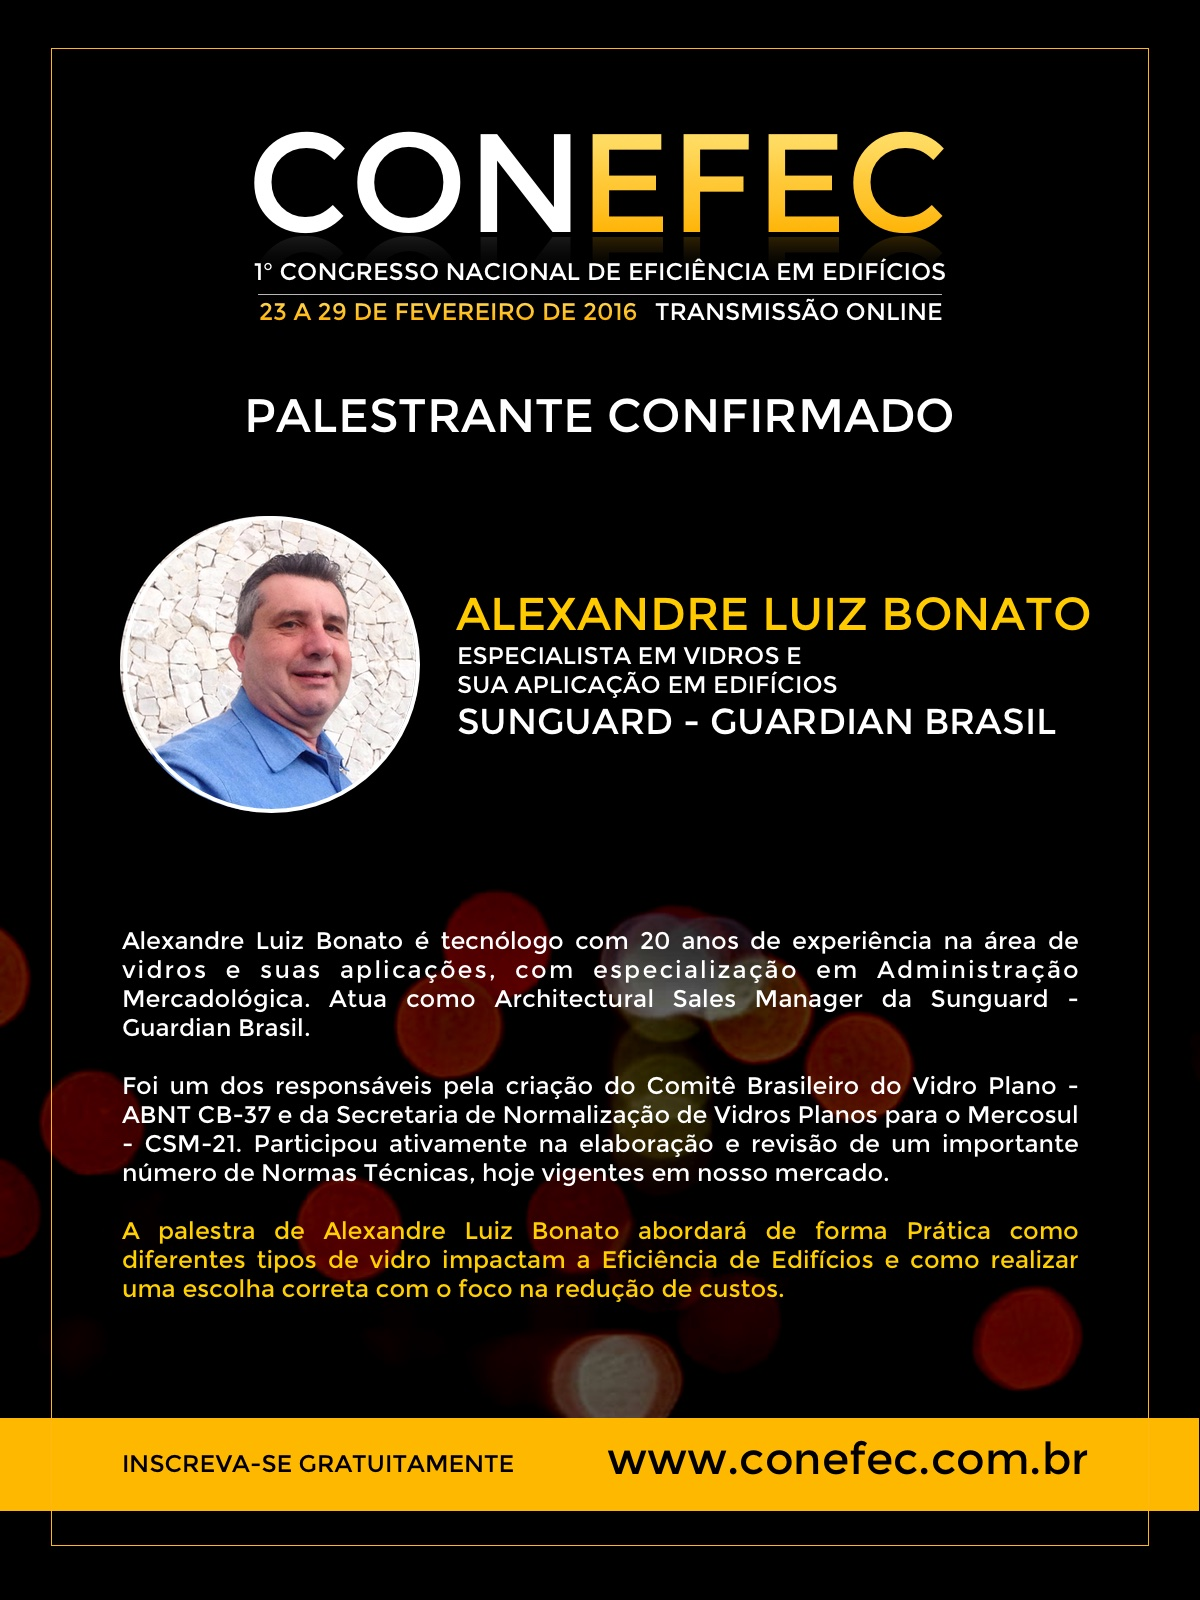 Alexandre Luiz Bonato-d